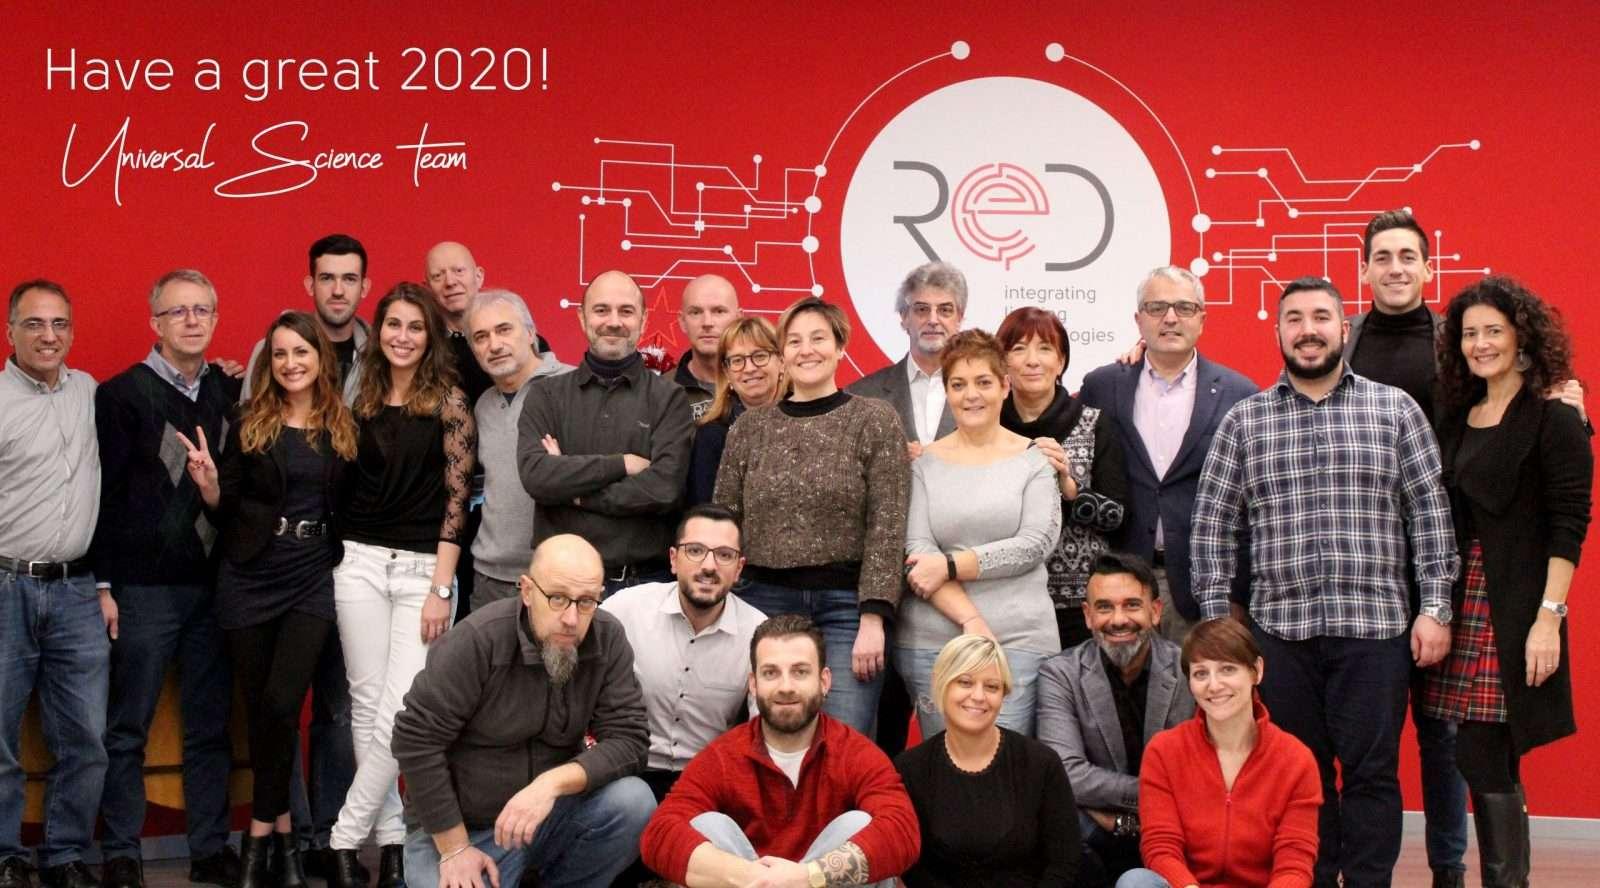 NEWS – Buon 2020 da Universal Science!